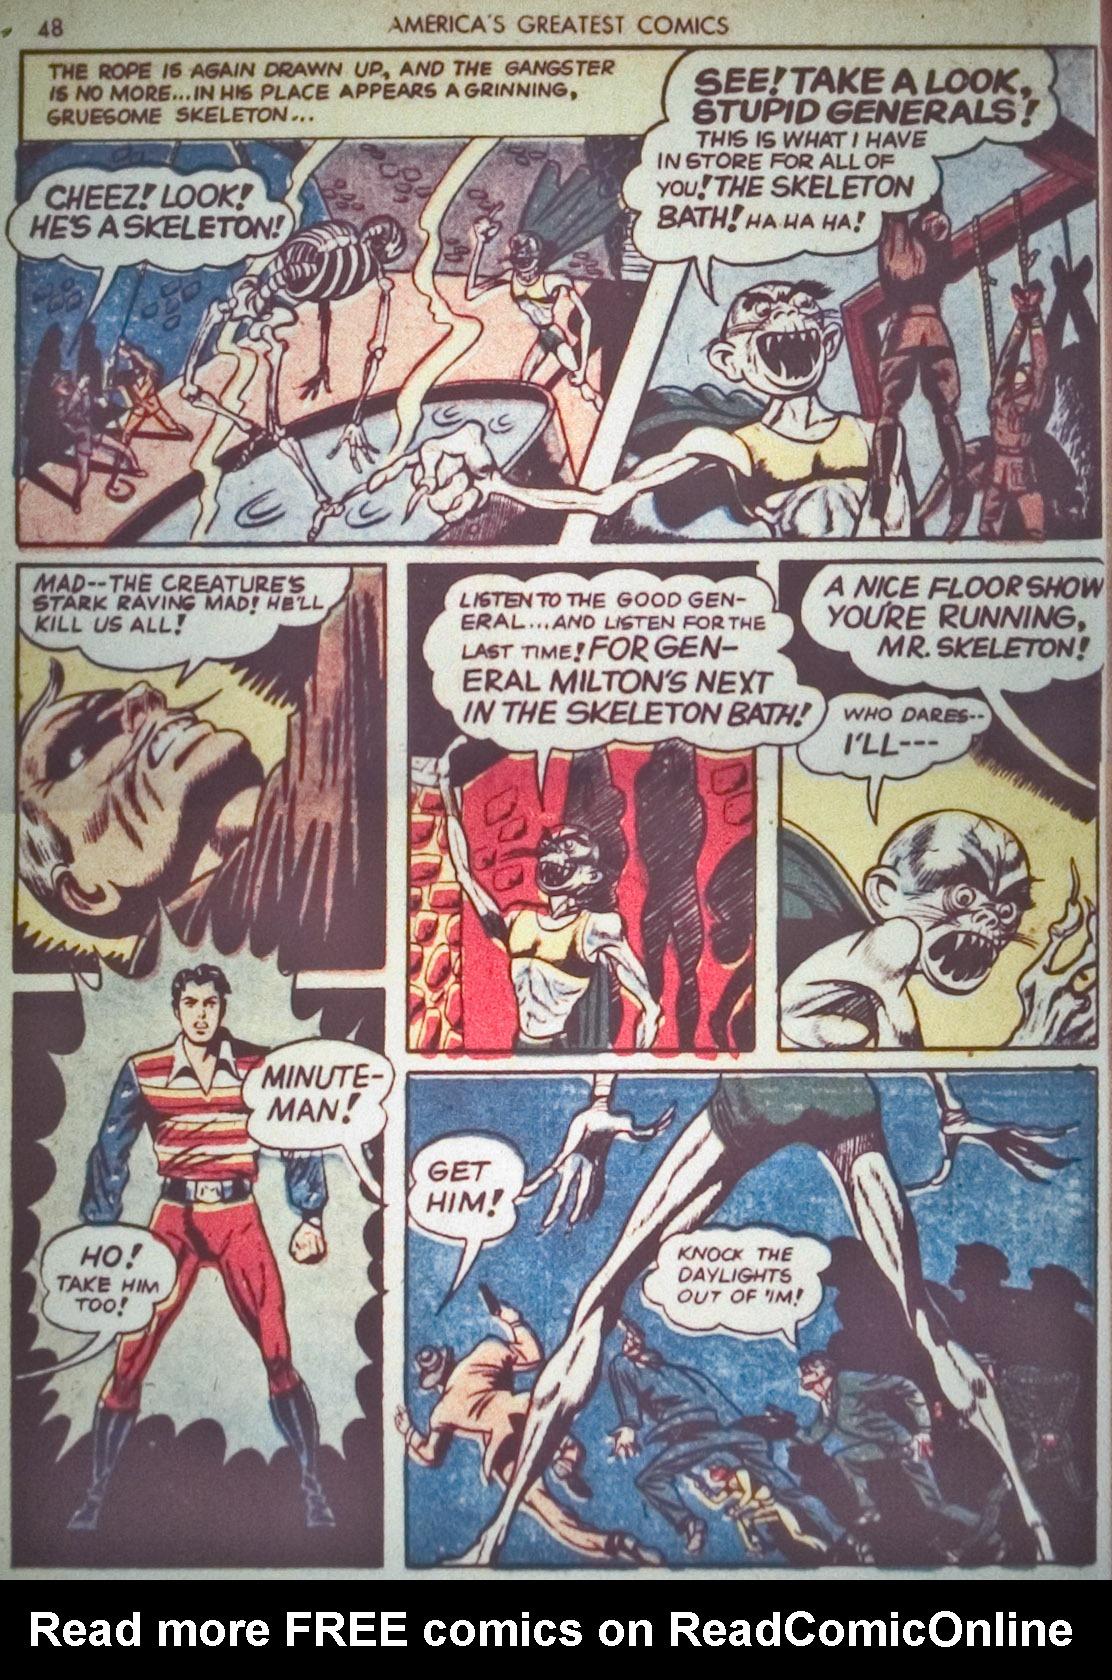 Read online America's Greatest Comics comic -  Issue #1 - 51